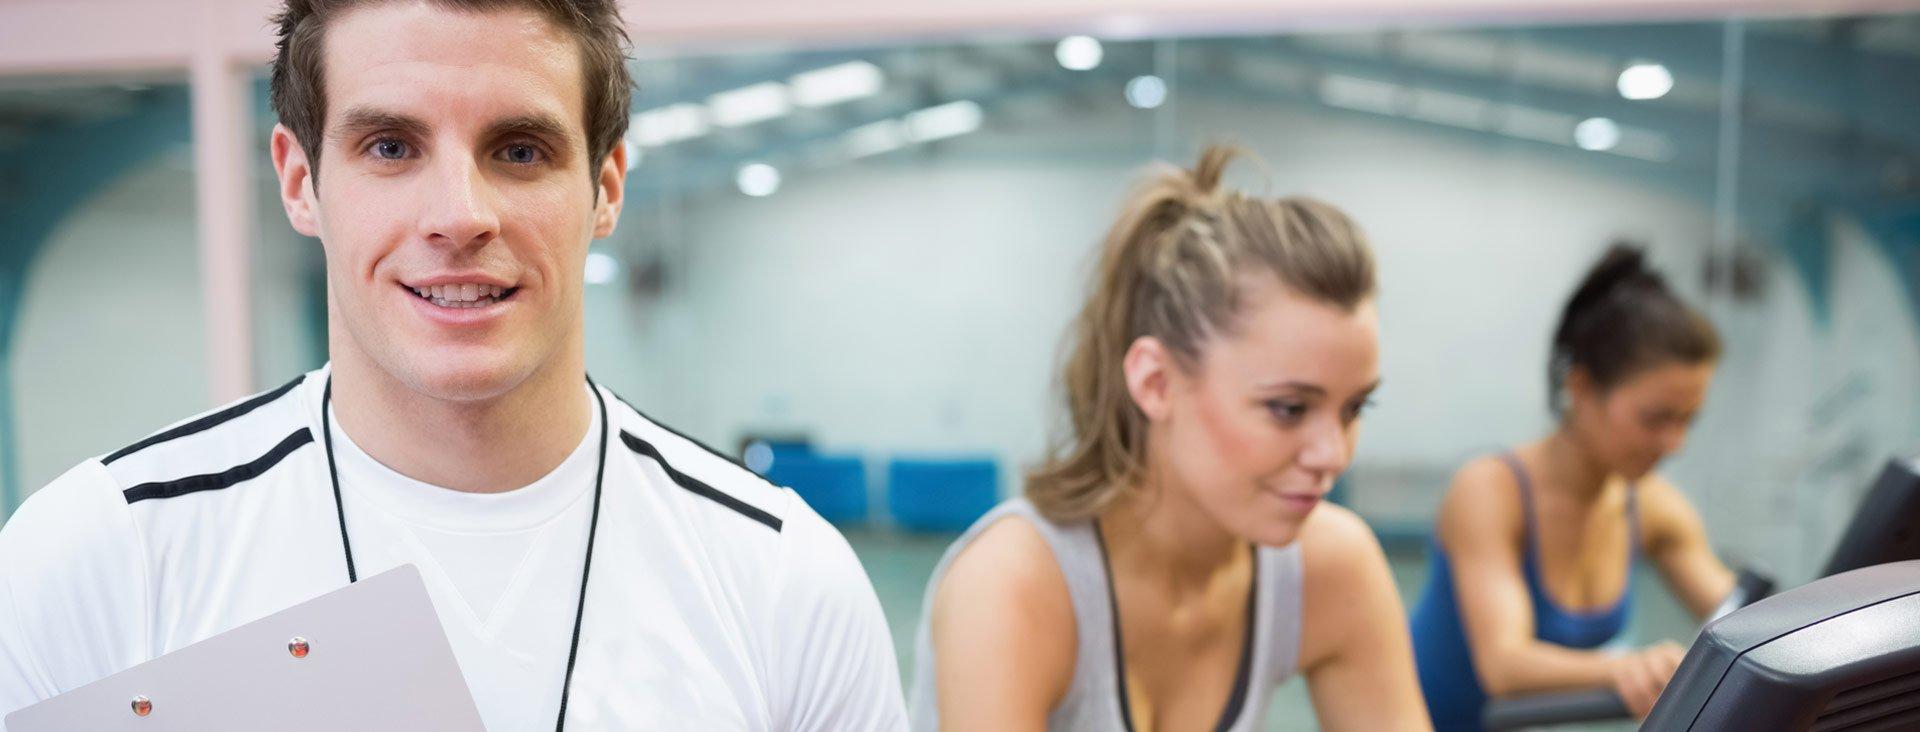 werk-als-fitnessisntructeur